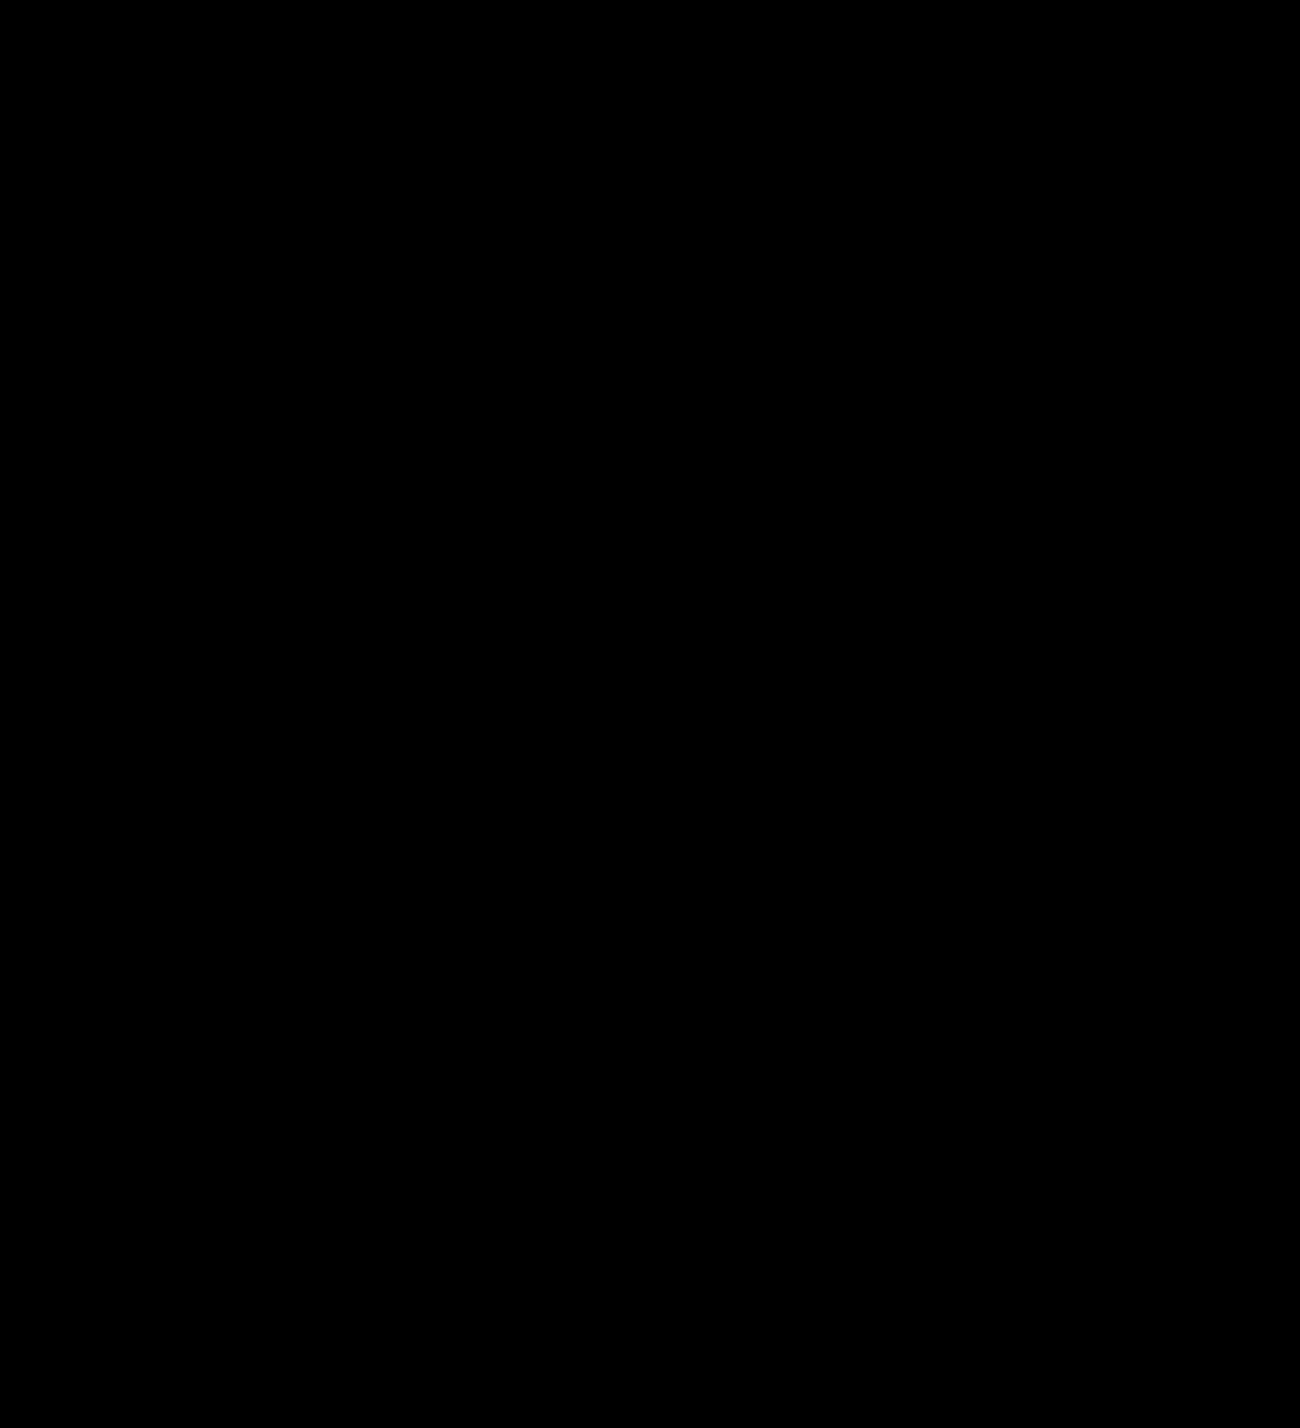 Image warriors of hope mage symbol monaca towag danganronpa thumbnail for version as of 1716 april 13 2017 buycottarizona Image collections